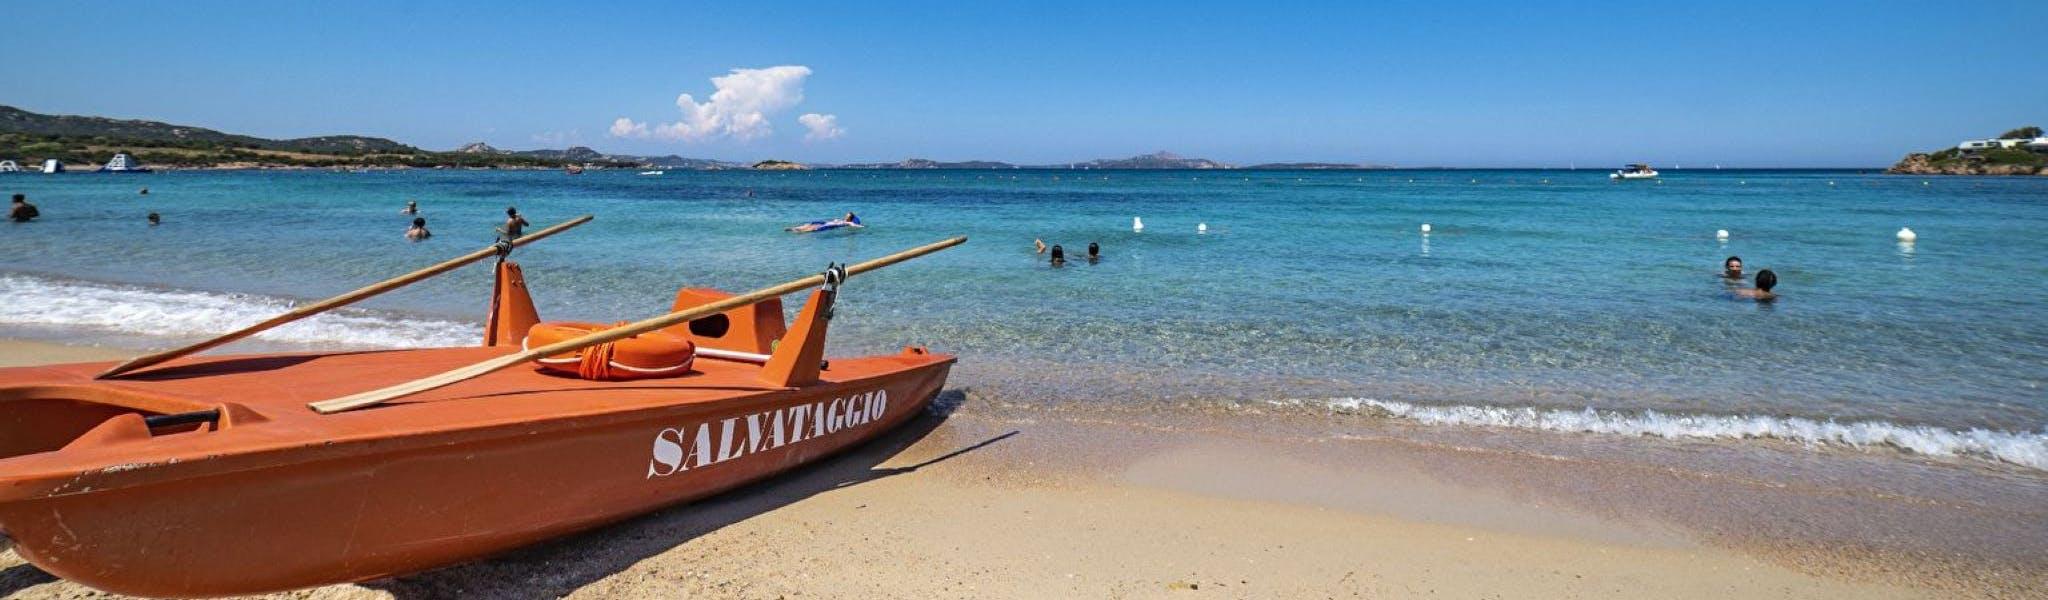 Bella Sardinia strand camping